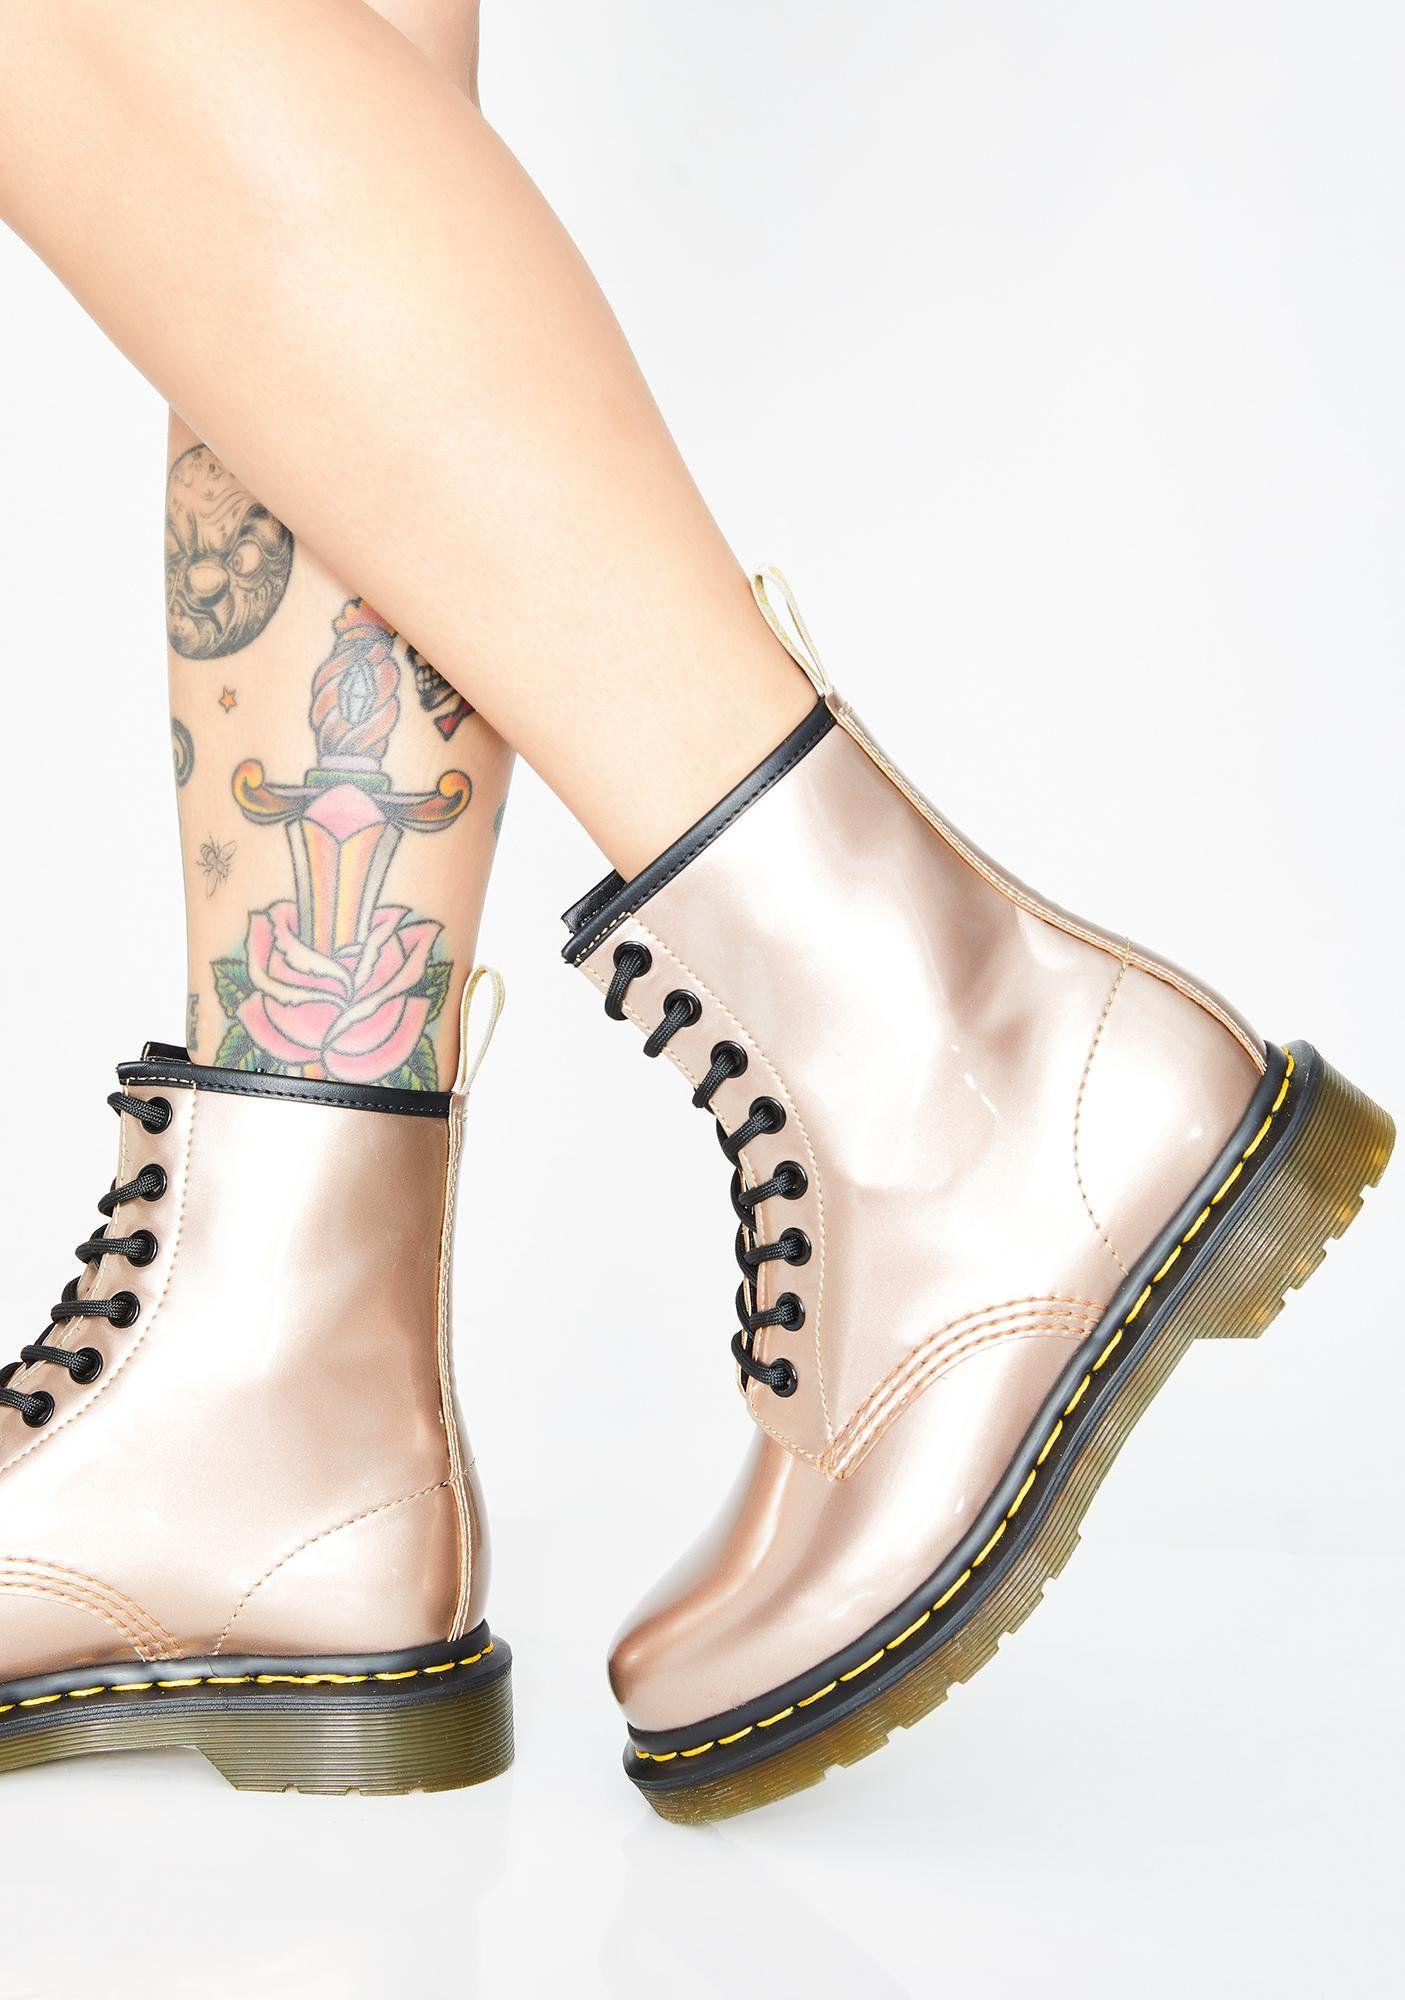 Rose Gold 1460 Vegan Chrome Boots